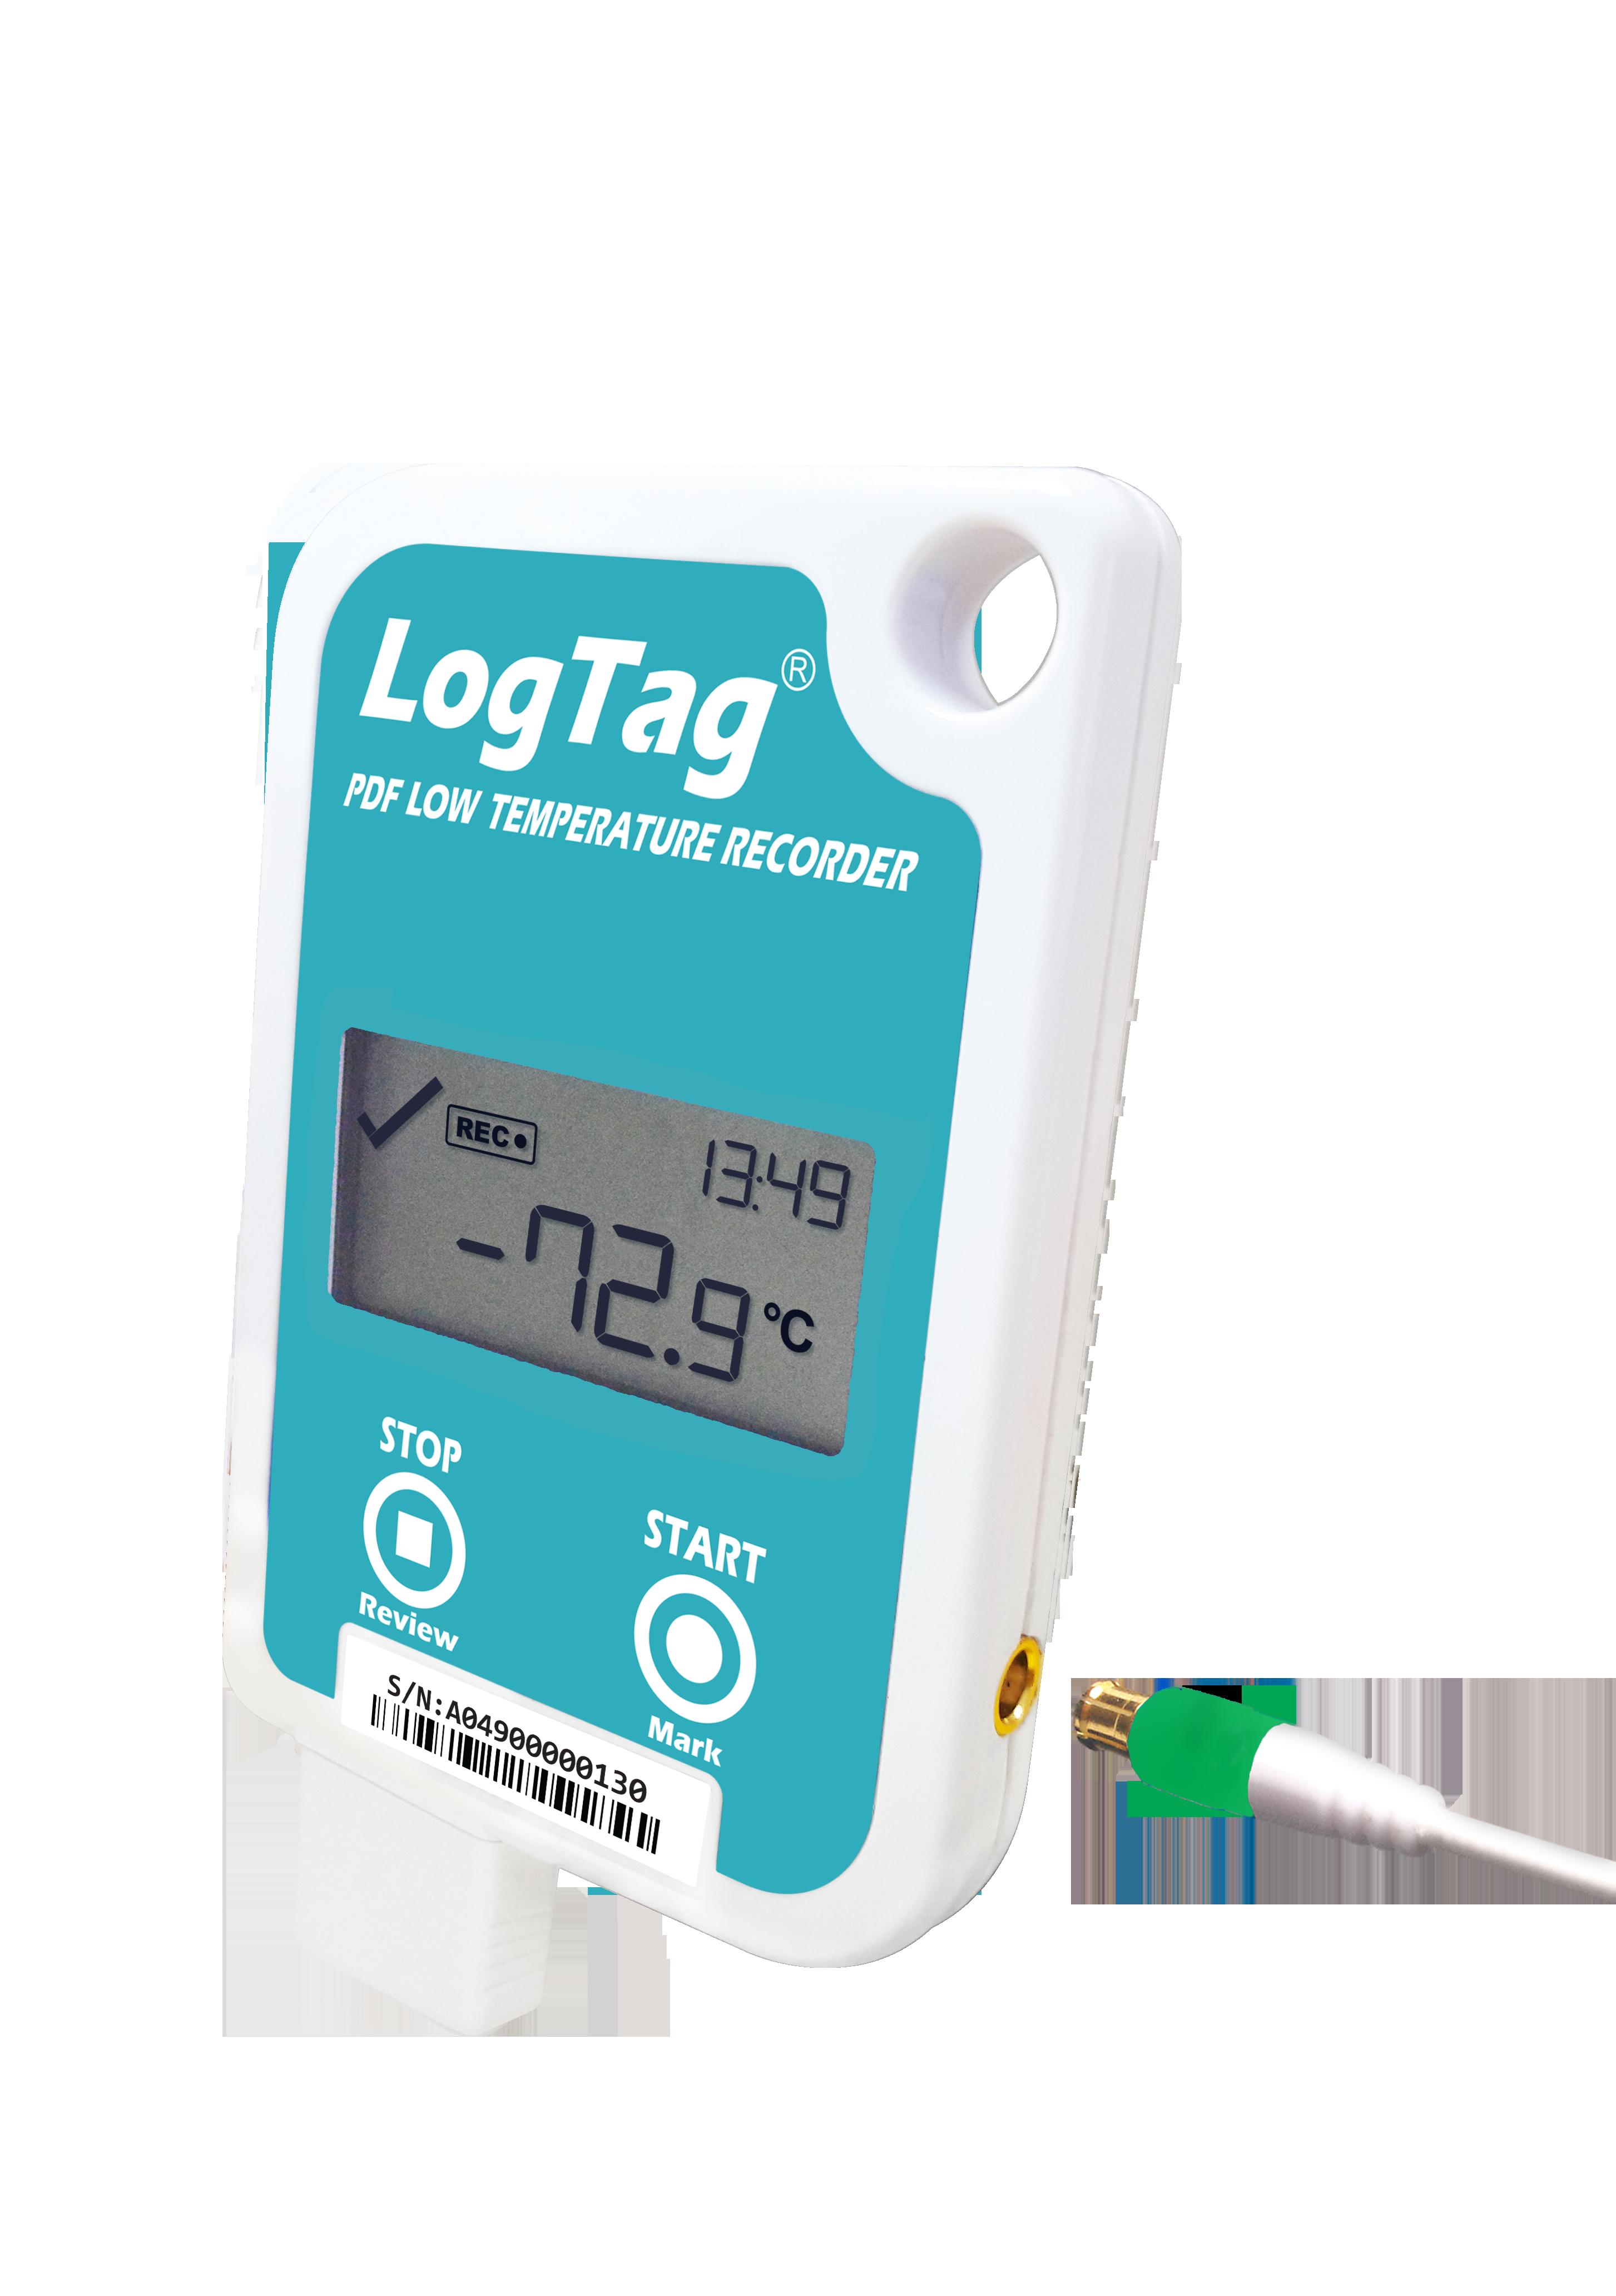 LogTag® UTREL-16F Ultra-Tieftemperatur-Datenlogger mit PDF Report & Display